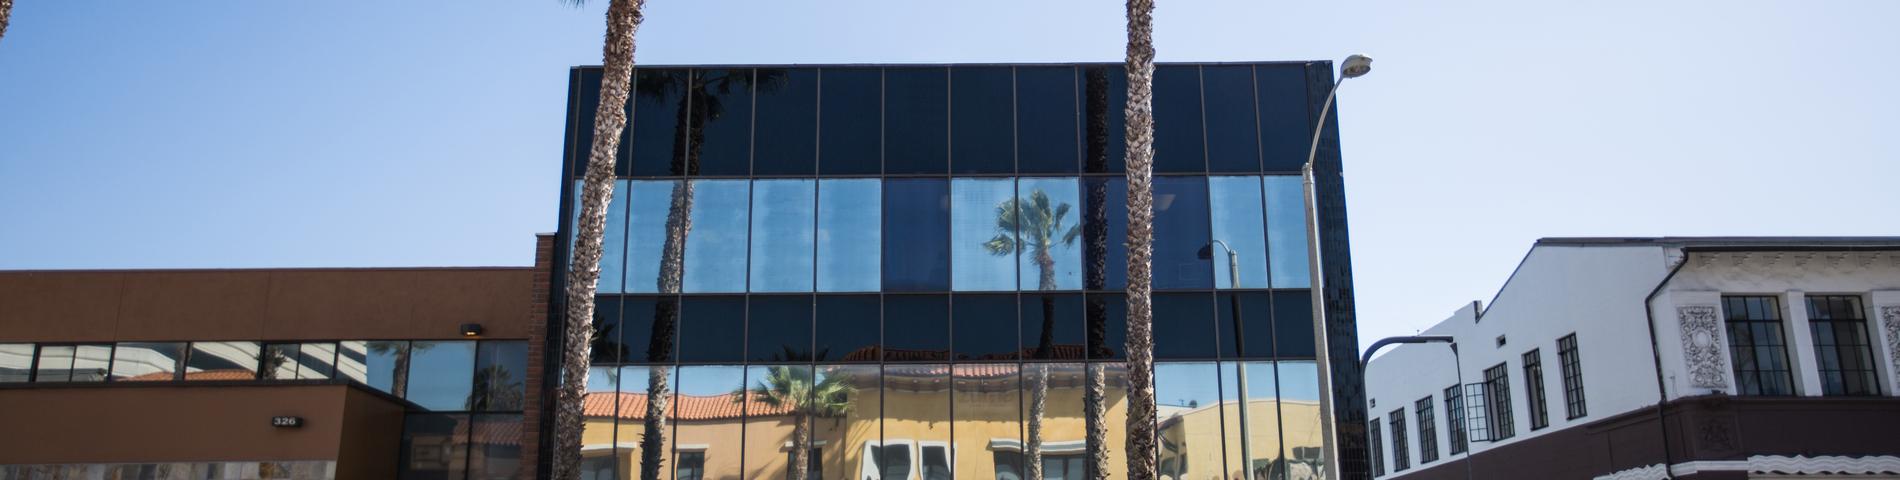 CEL College of English Language Santa Monica画像1